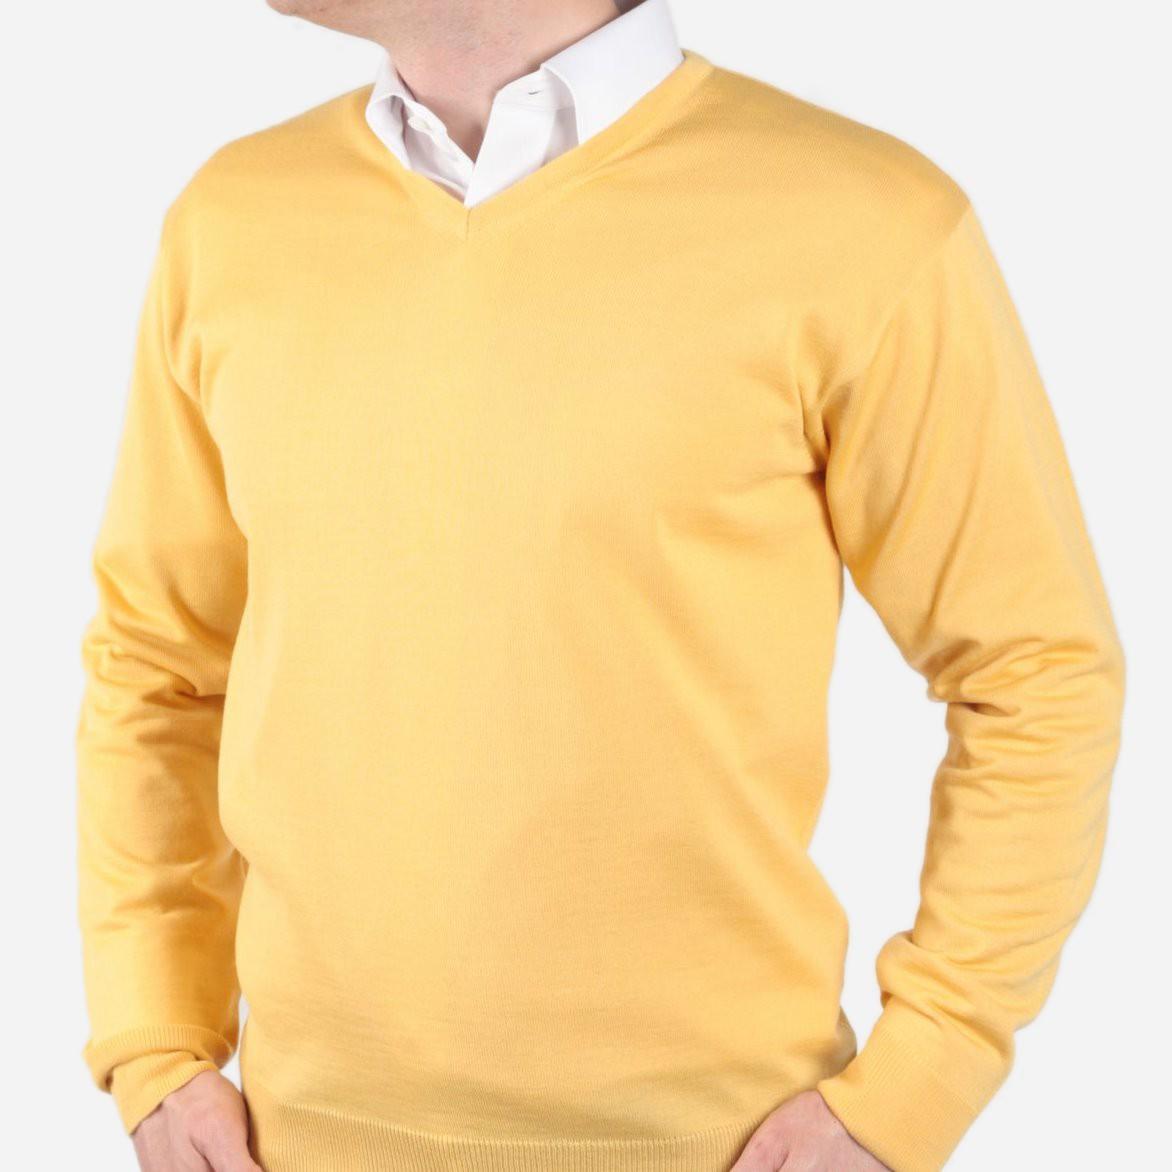 Pulower cienki Willsoor - żółty